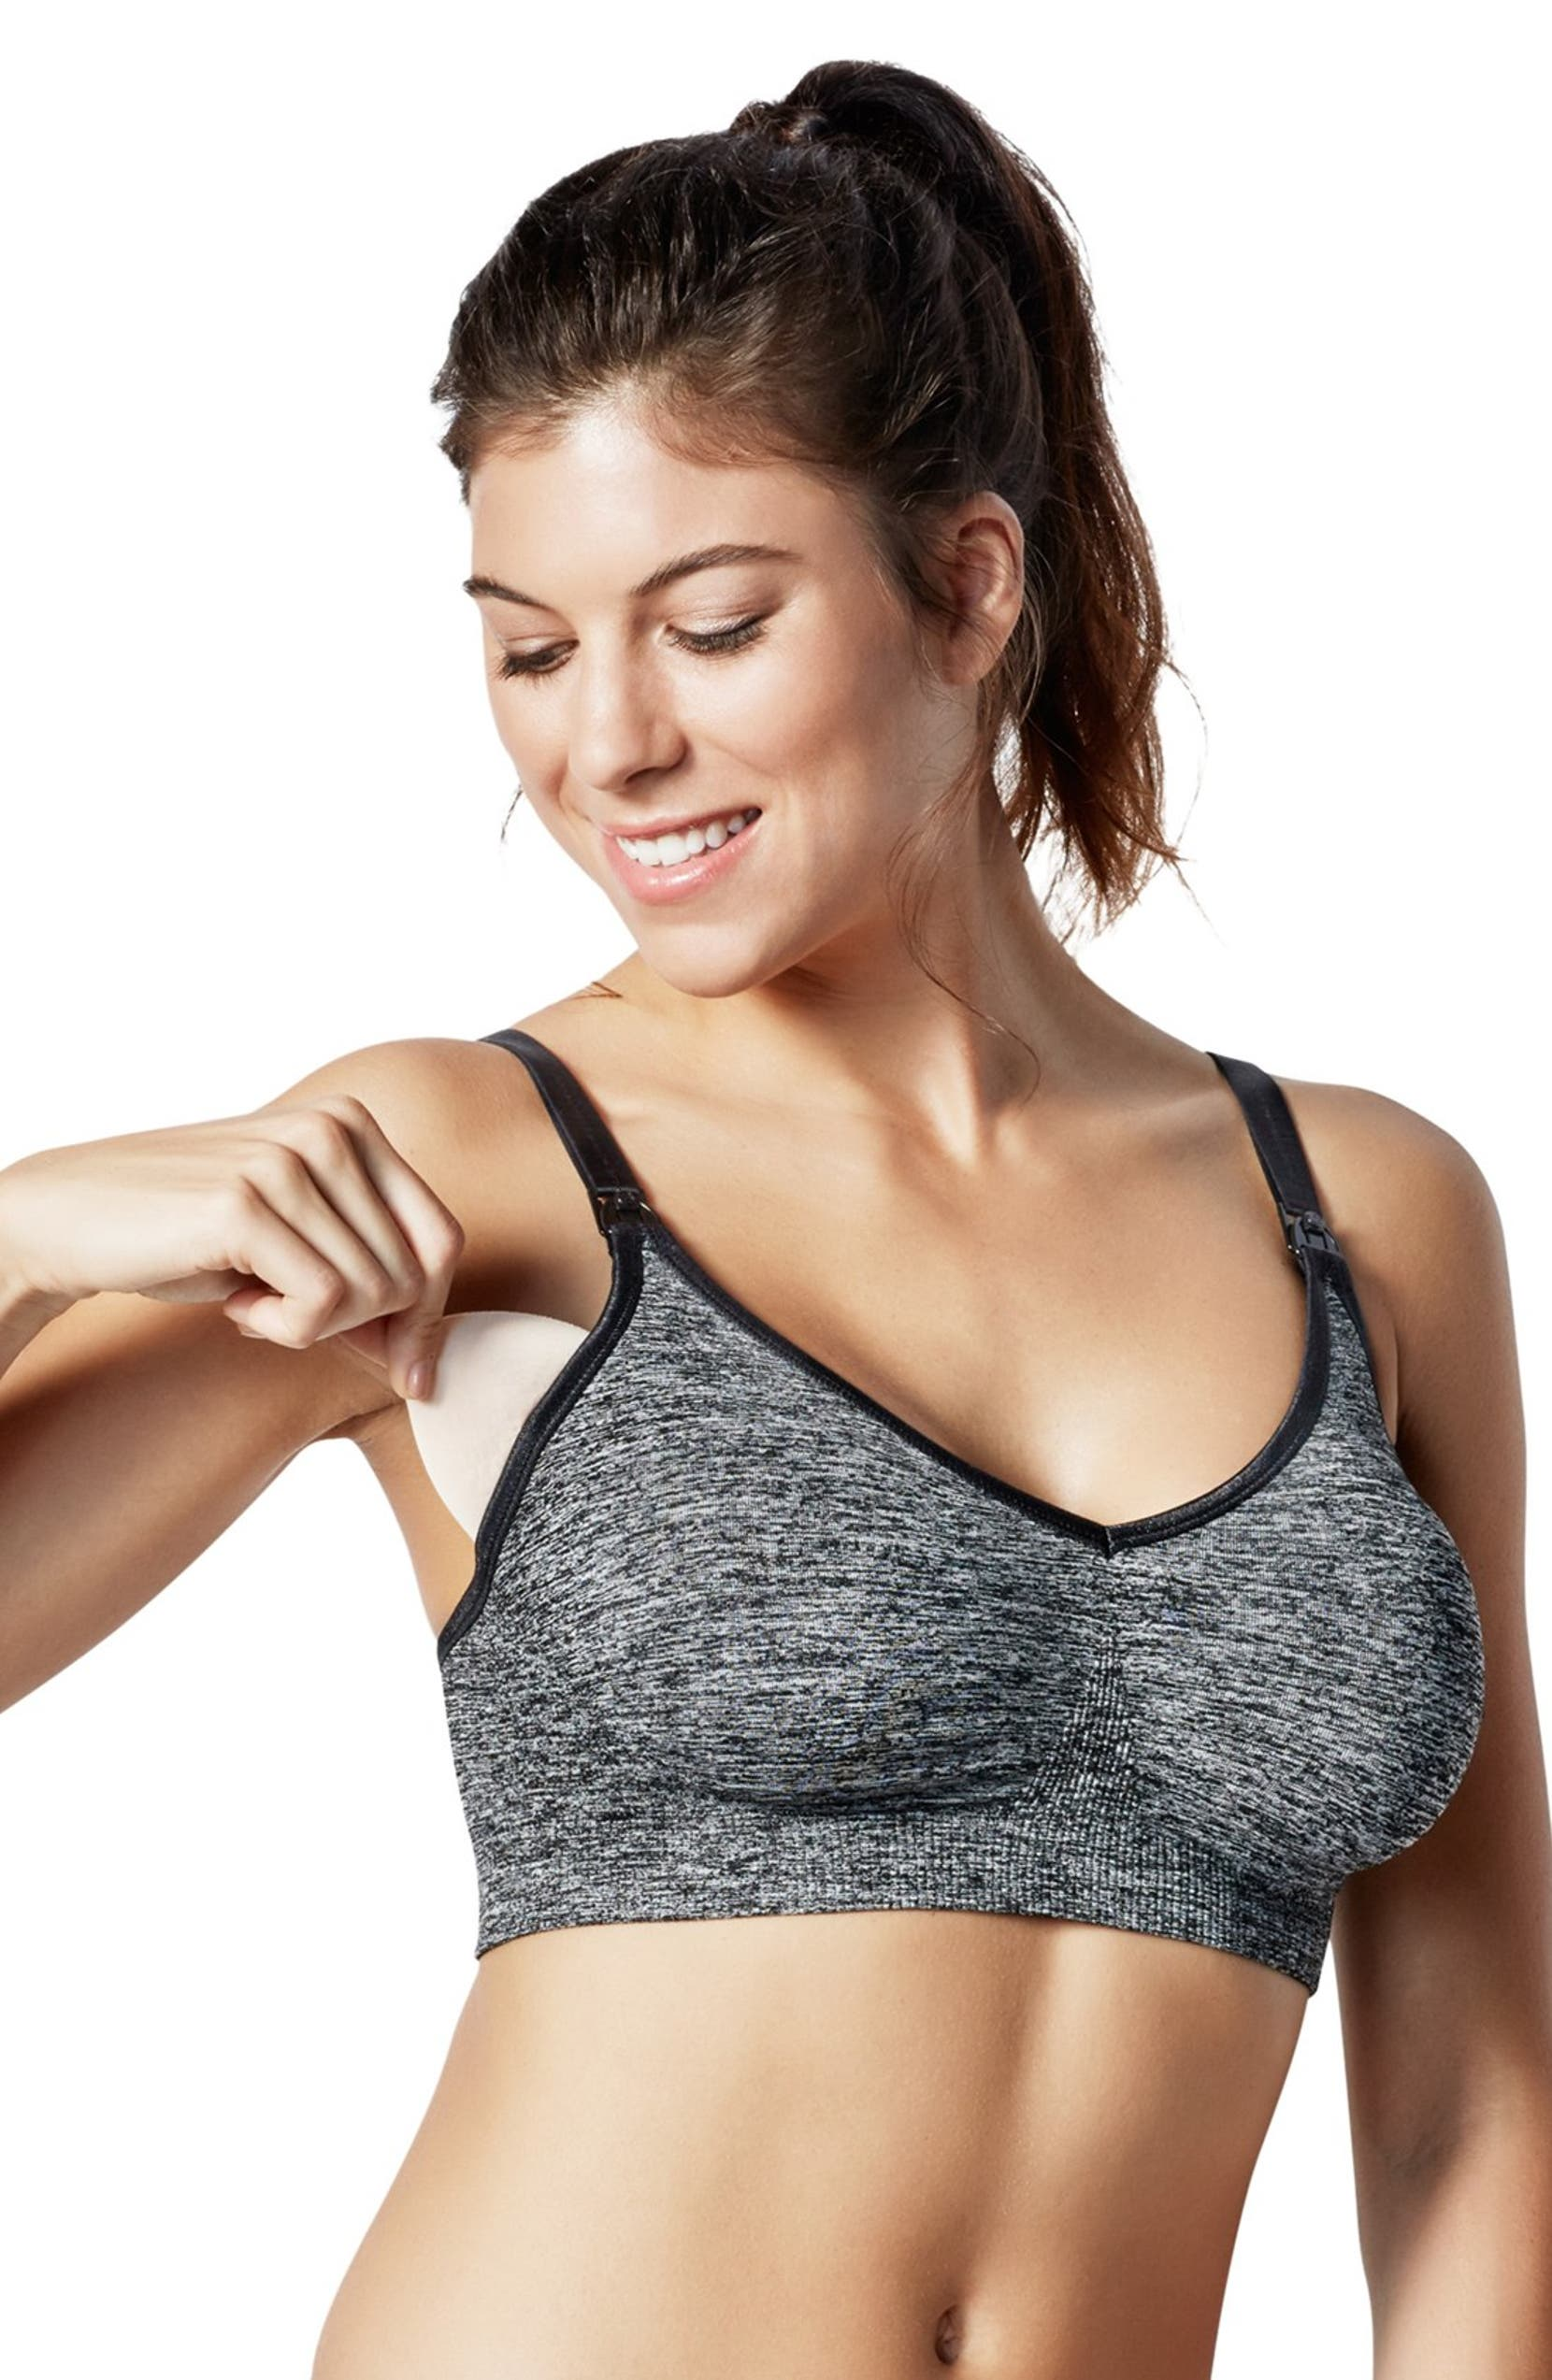 ac6486c94 Bravado Designs  Body Silk  Seamless Yoga Maternity Nursing Bra ...